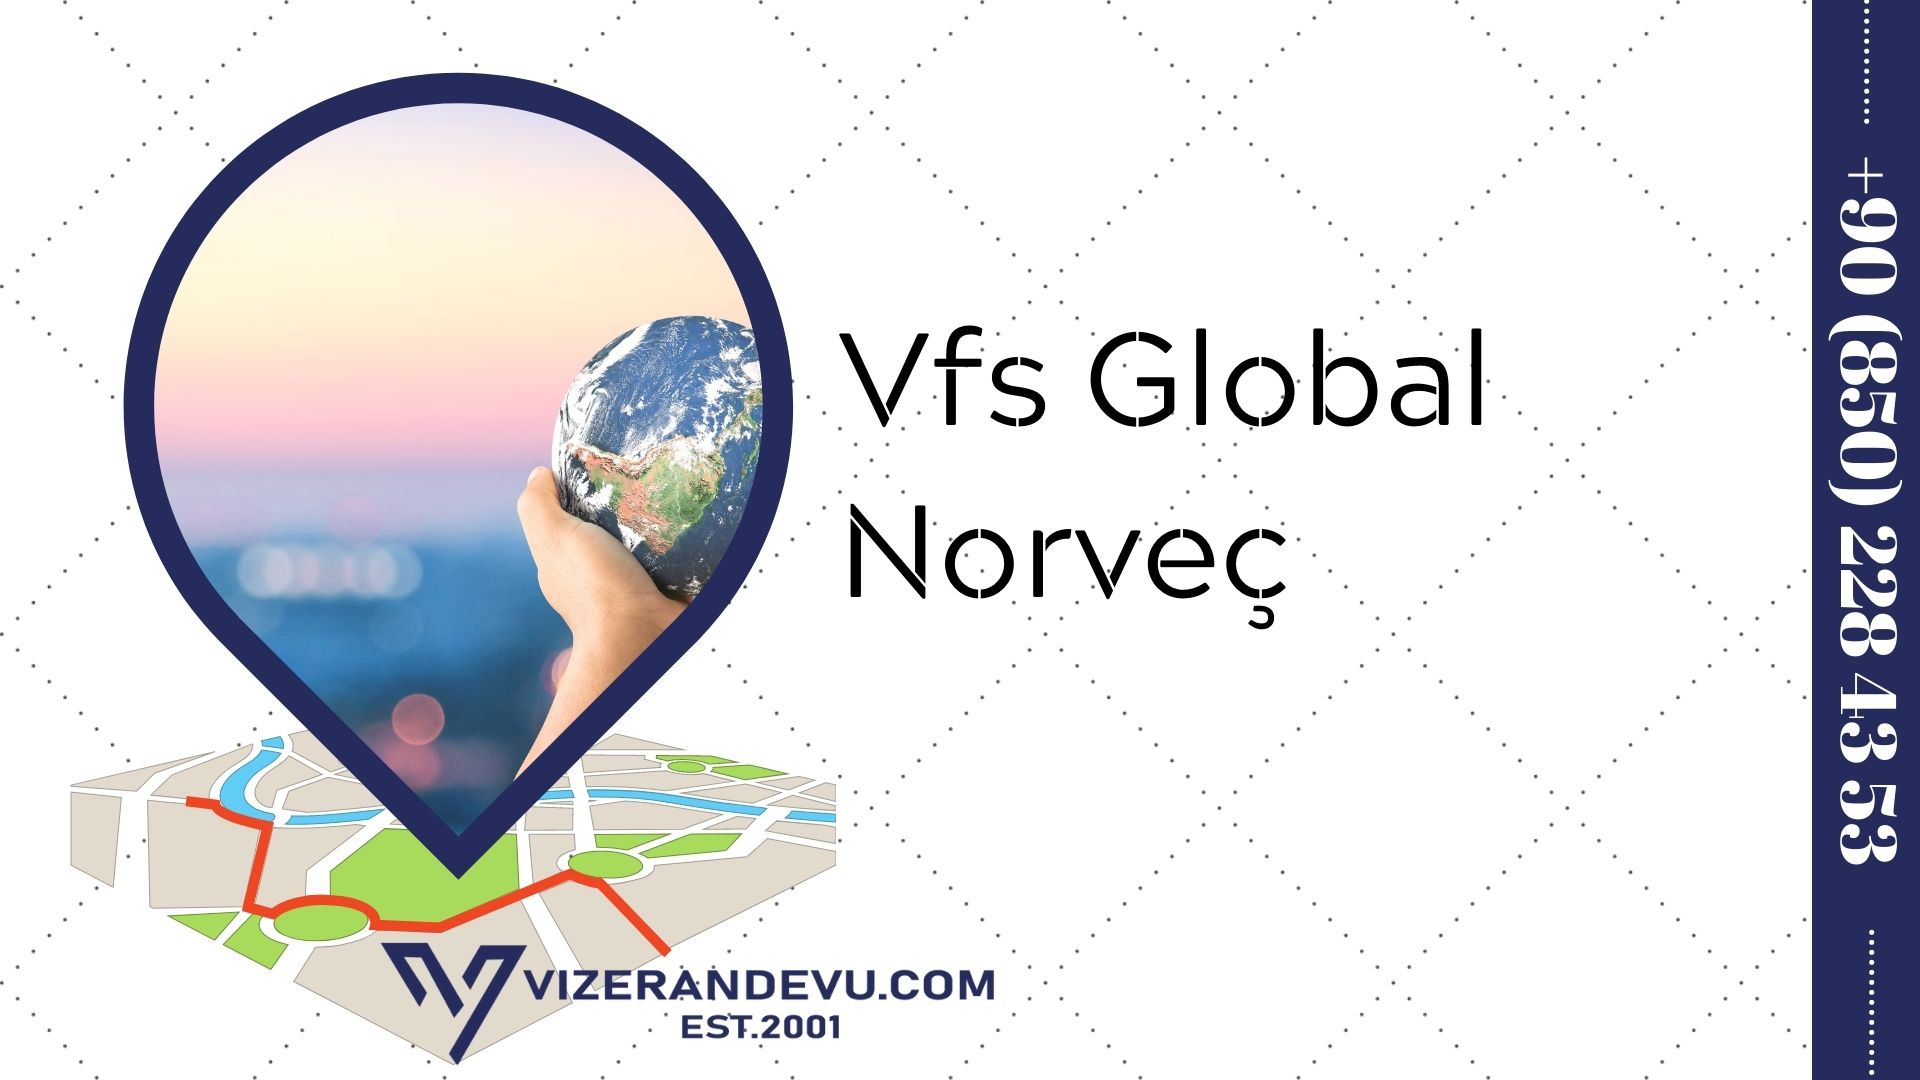 Vfs Global Norveç